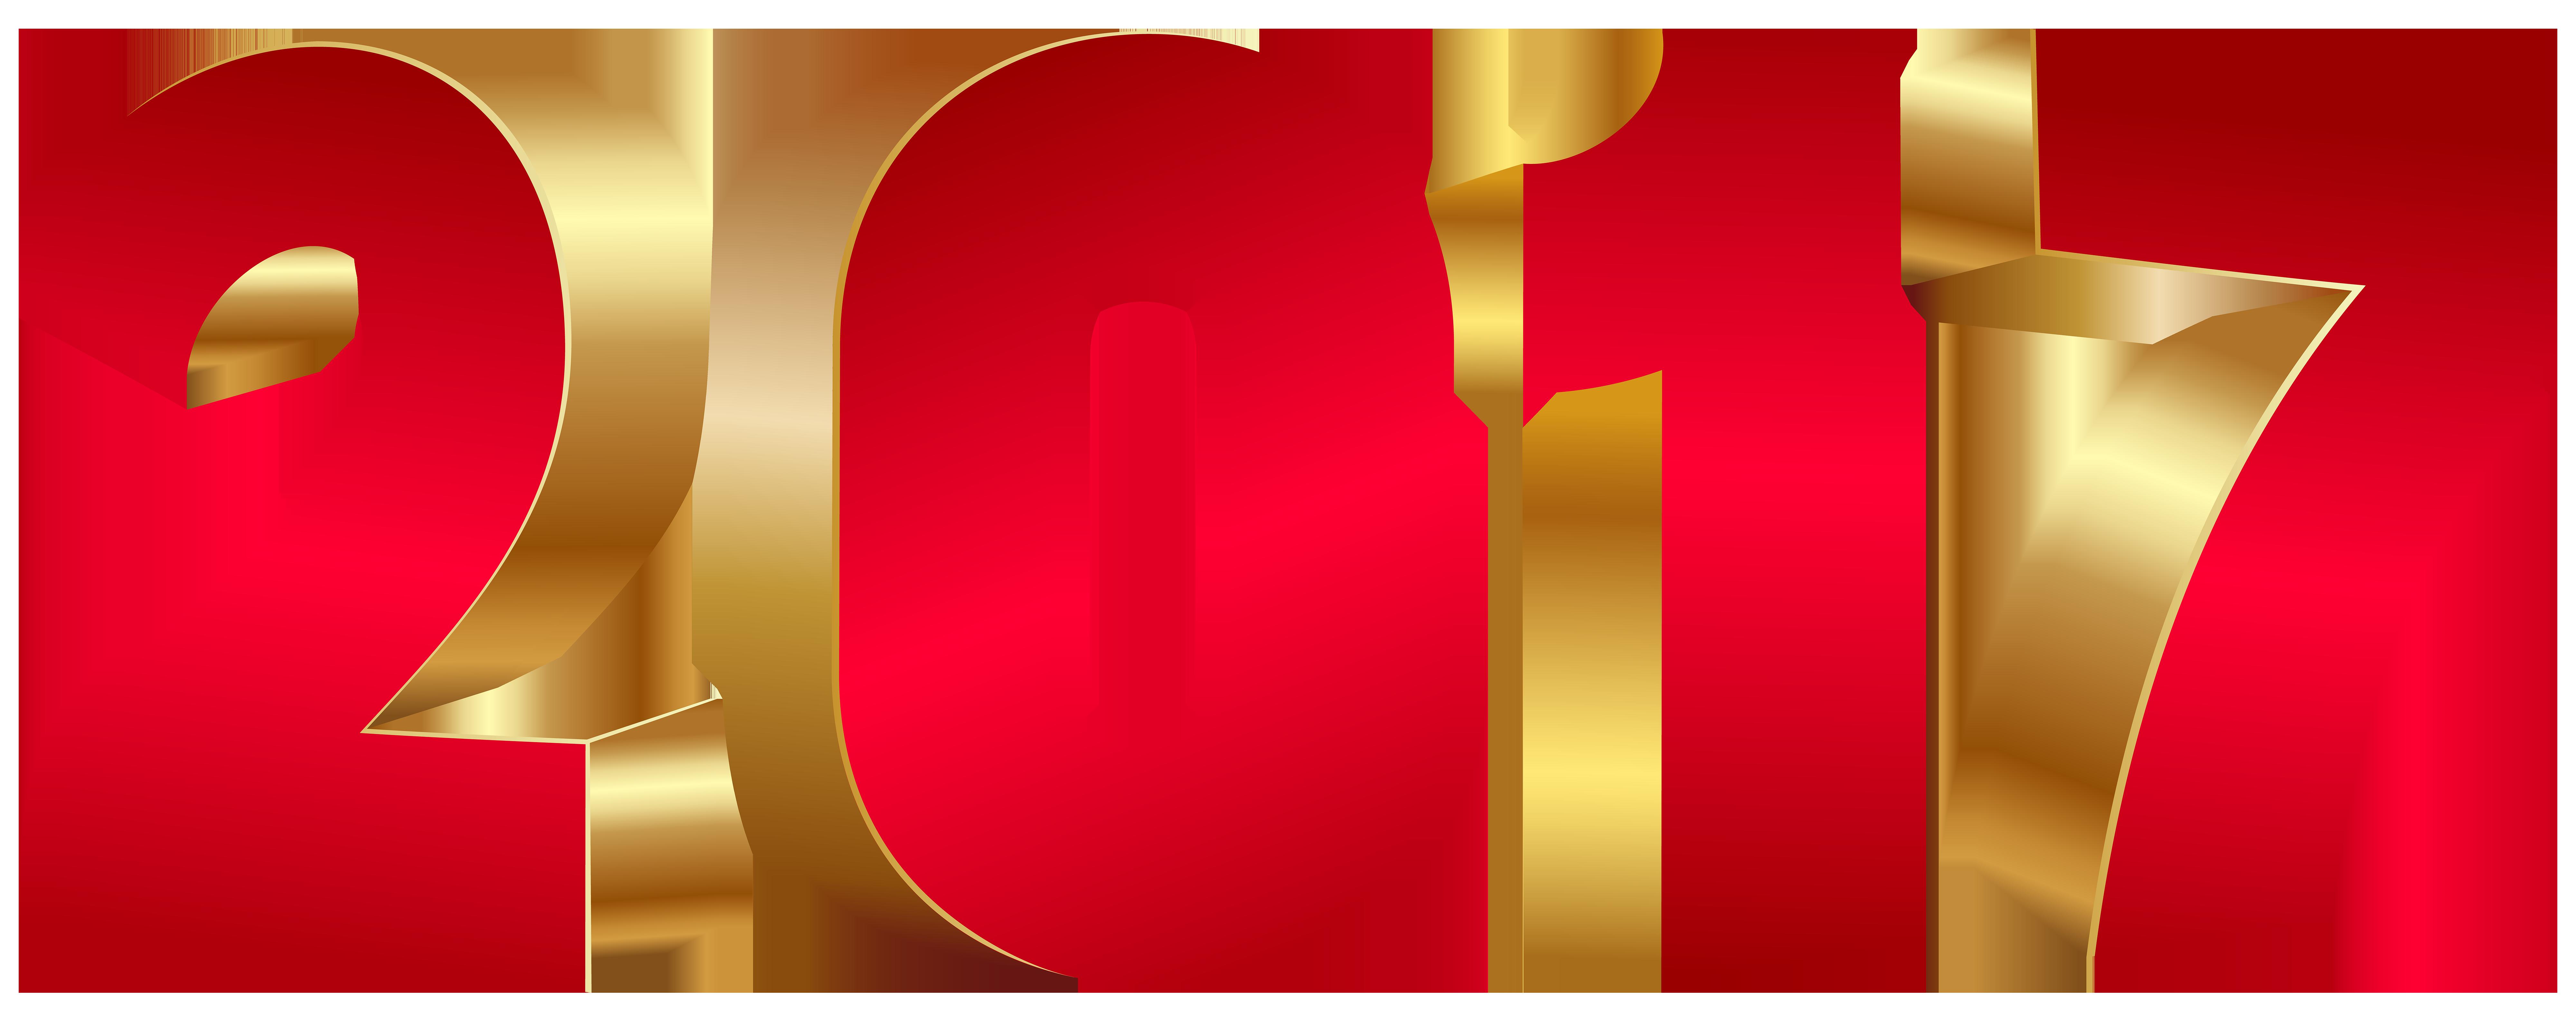 2017 Red Gold Large PNG Transparent Image.